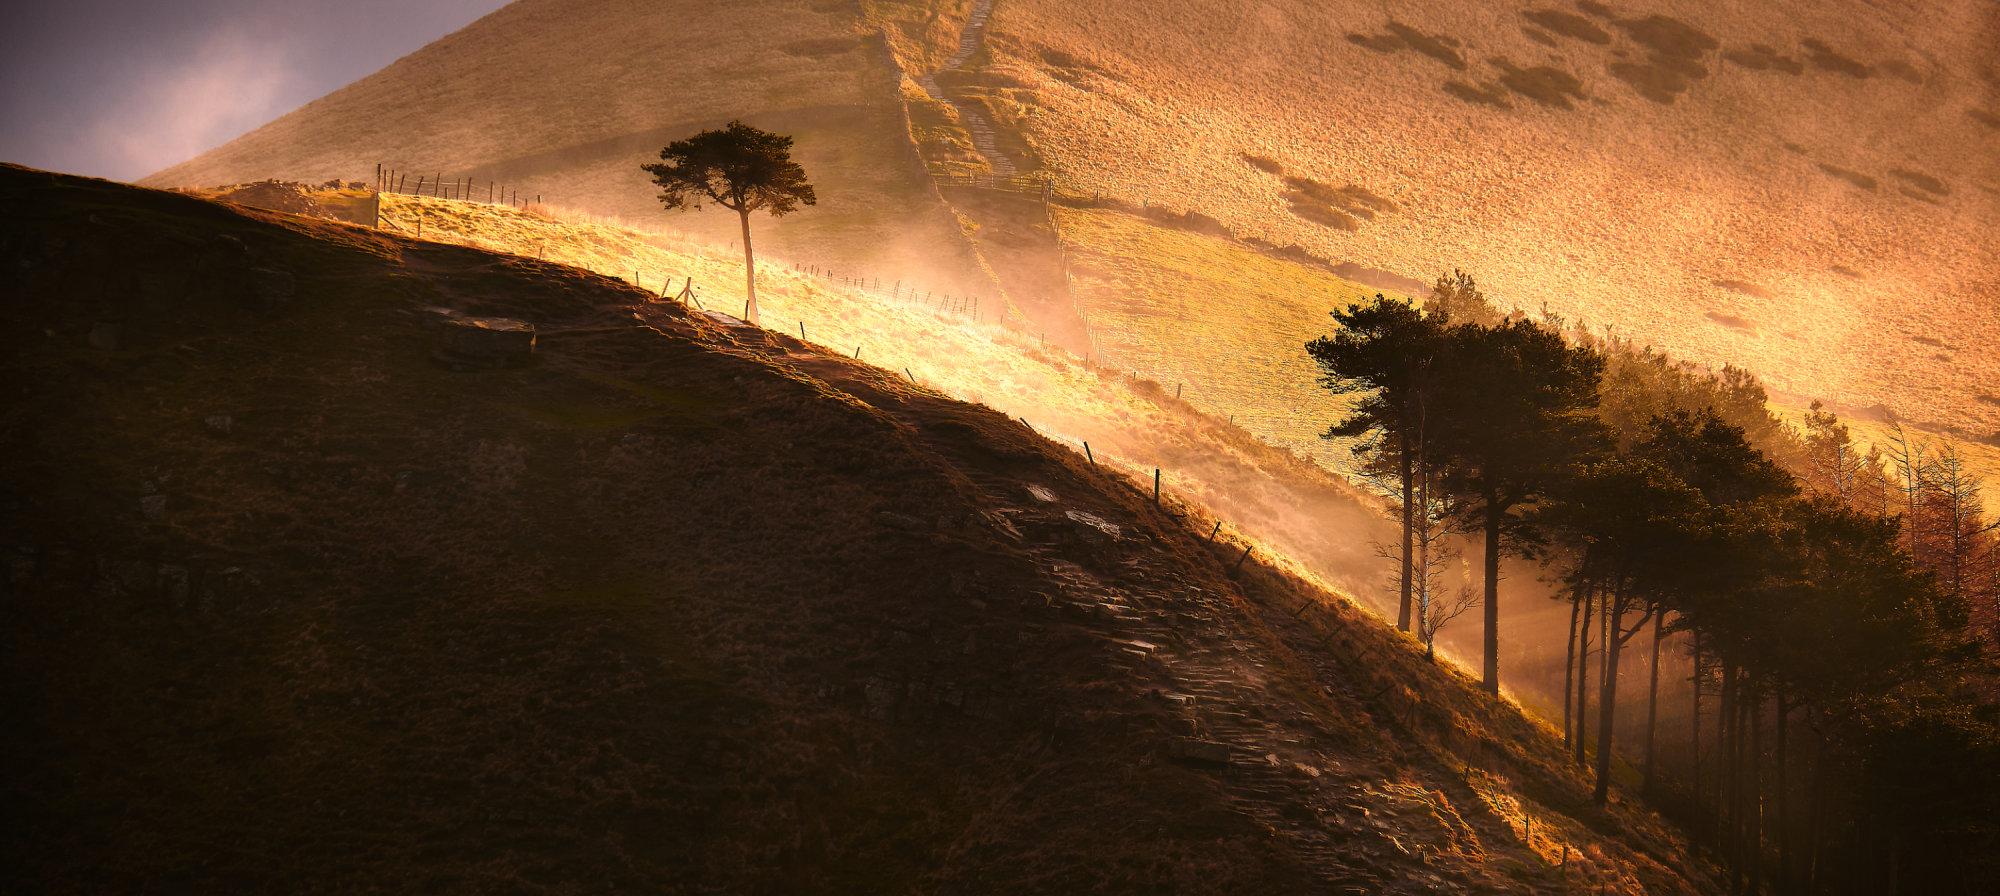 The single tree